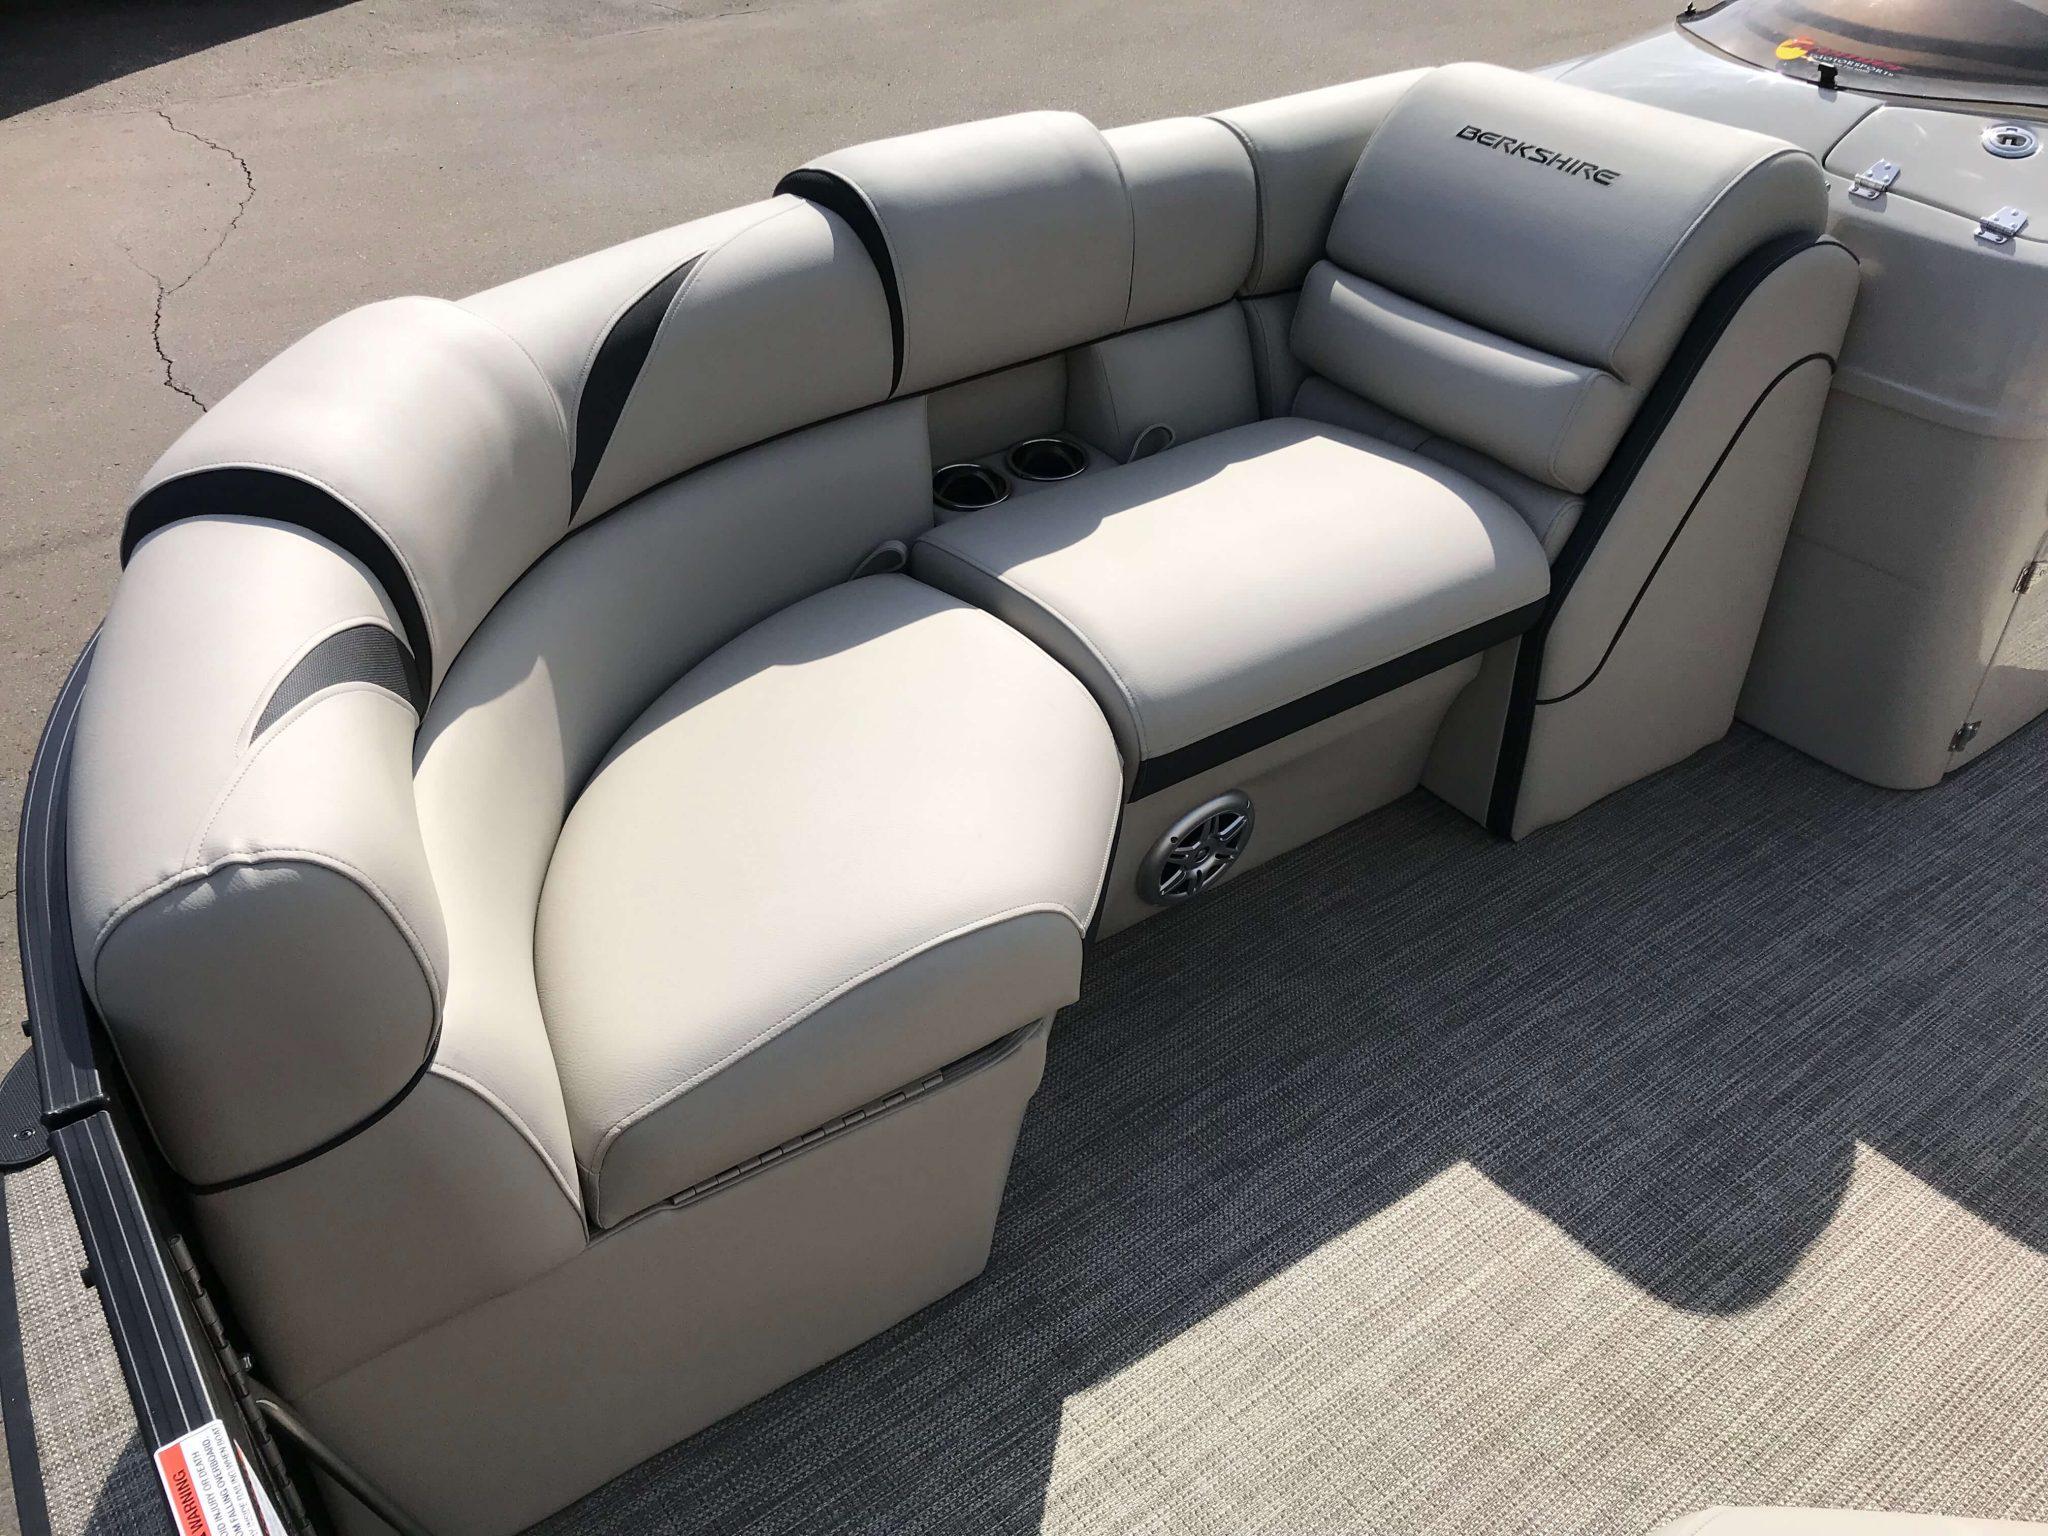 2019 Berkshire 23RFX STS Seating 4